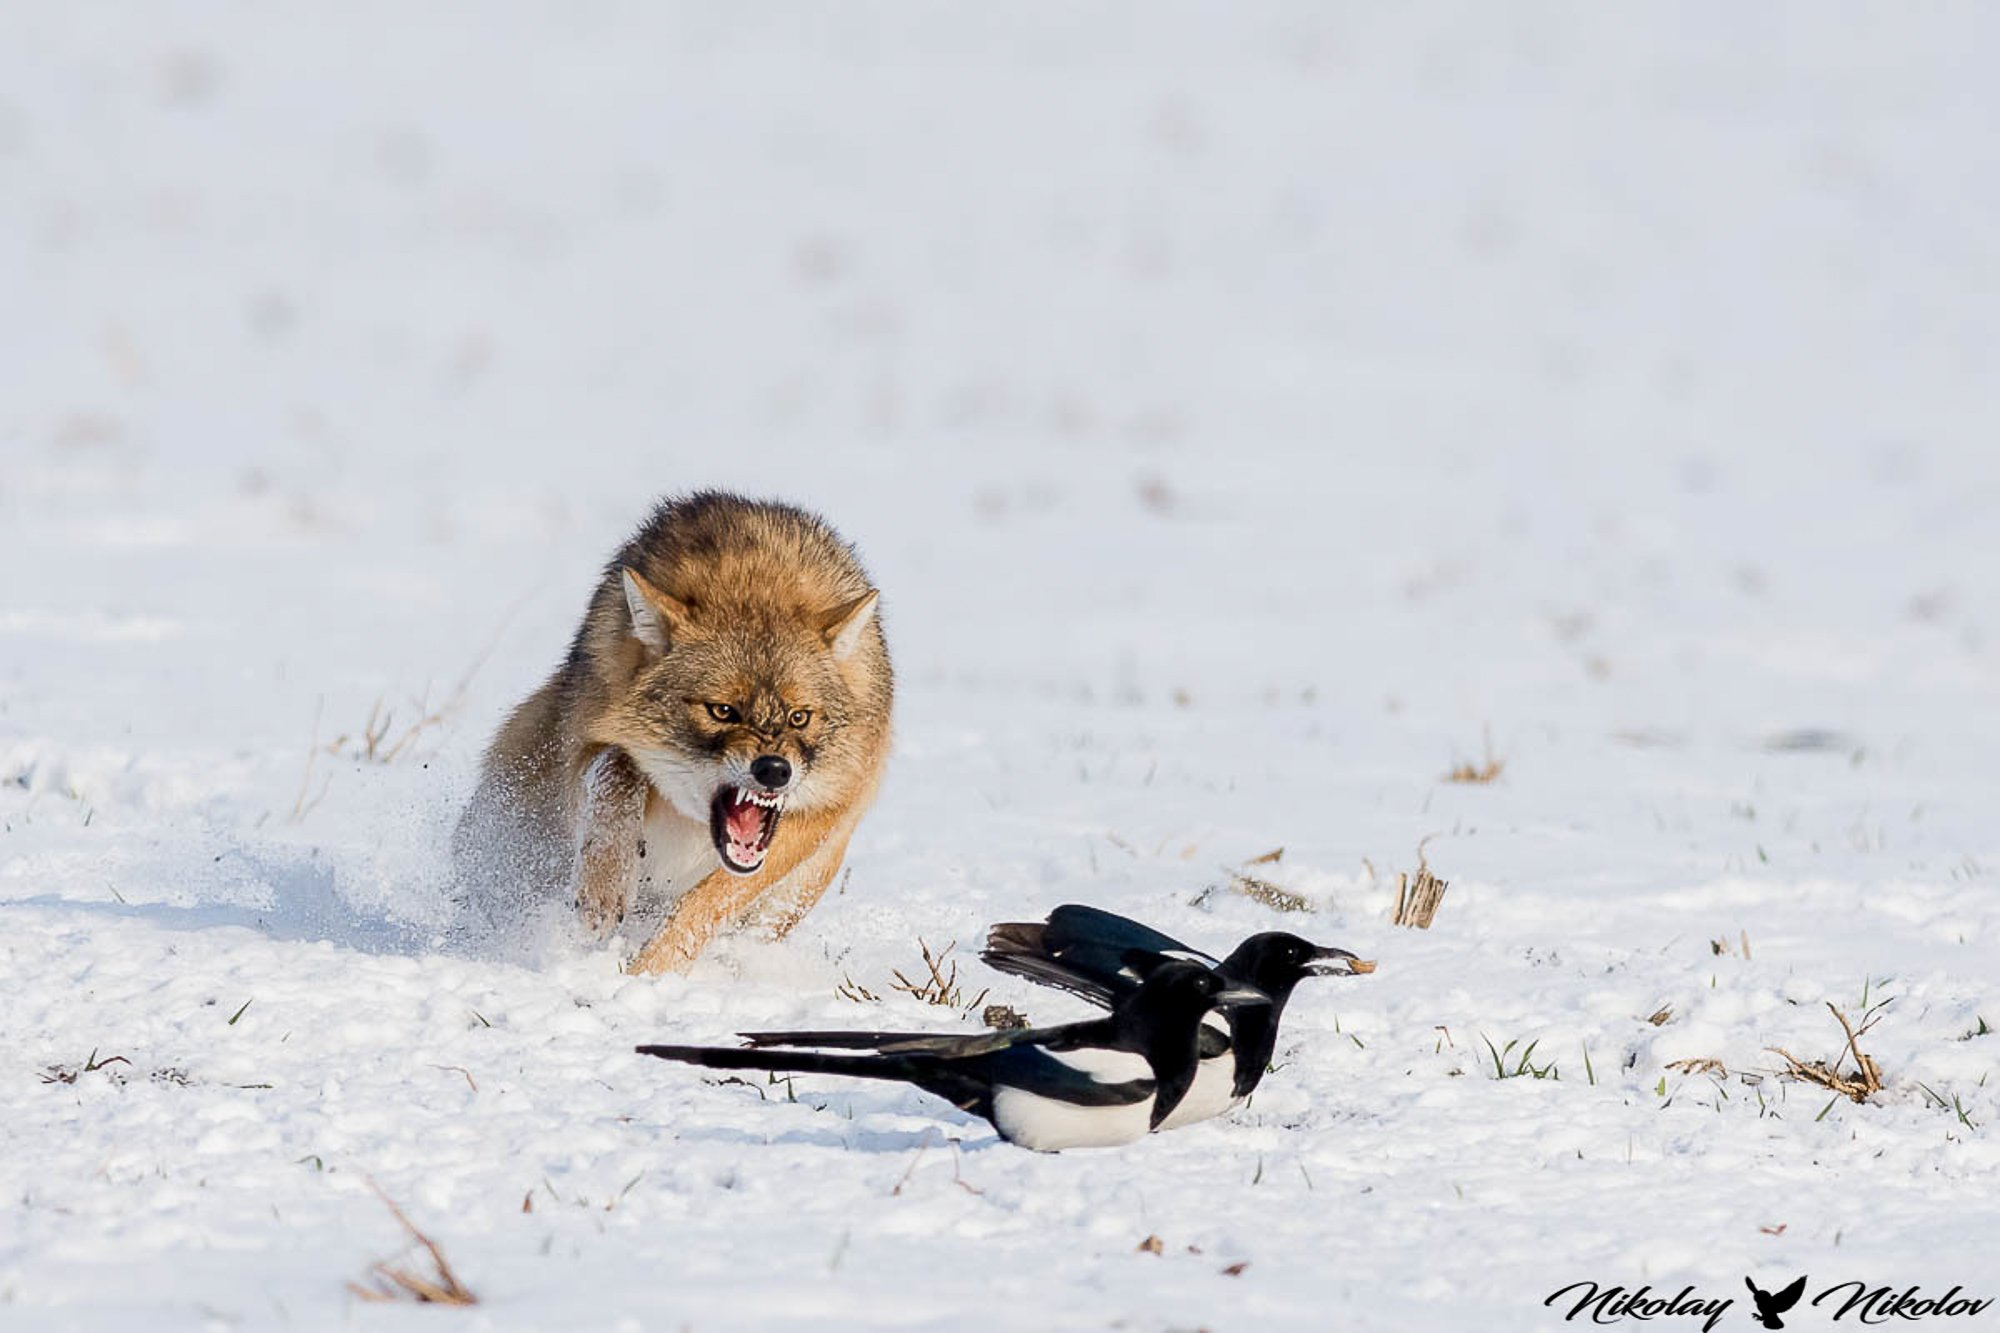 jackal,winter,snow,wildlife,landscape,run,action,fury,range,run, Nikolay Nikolov